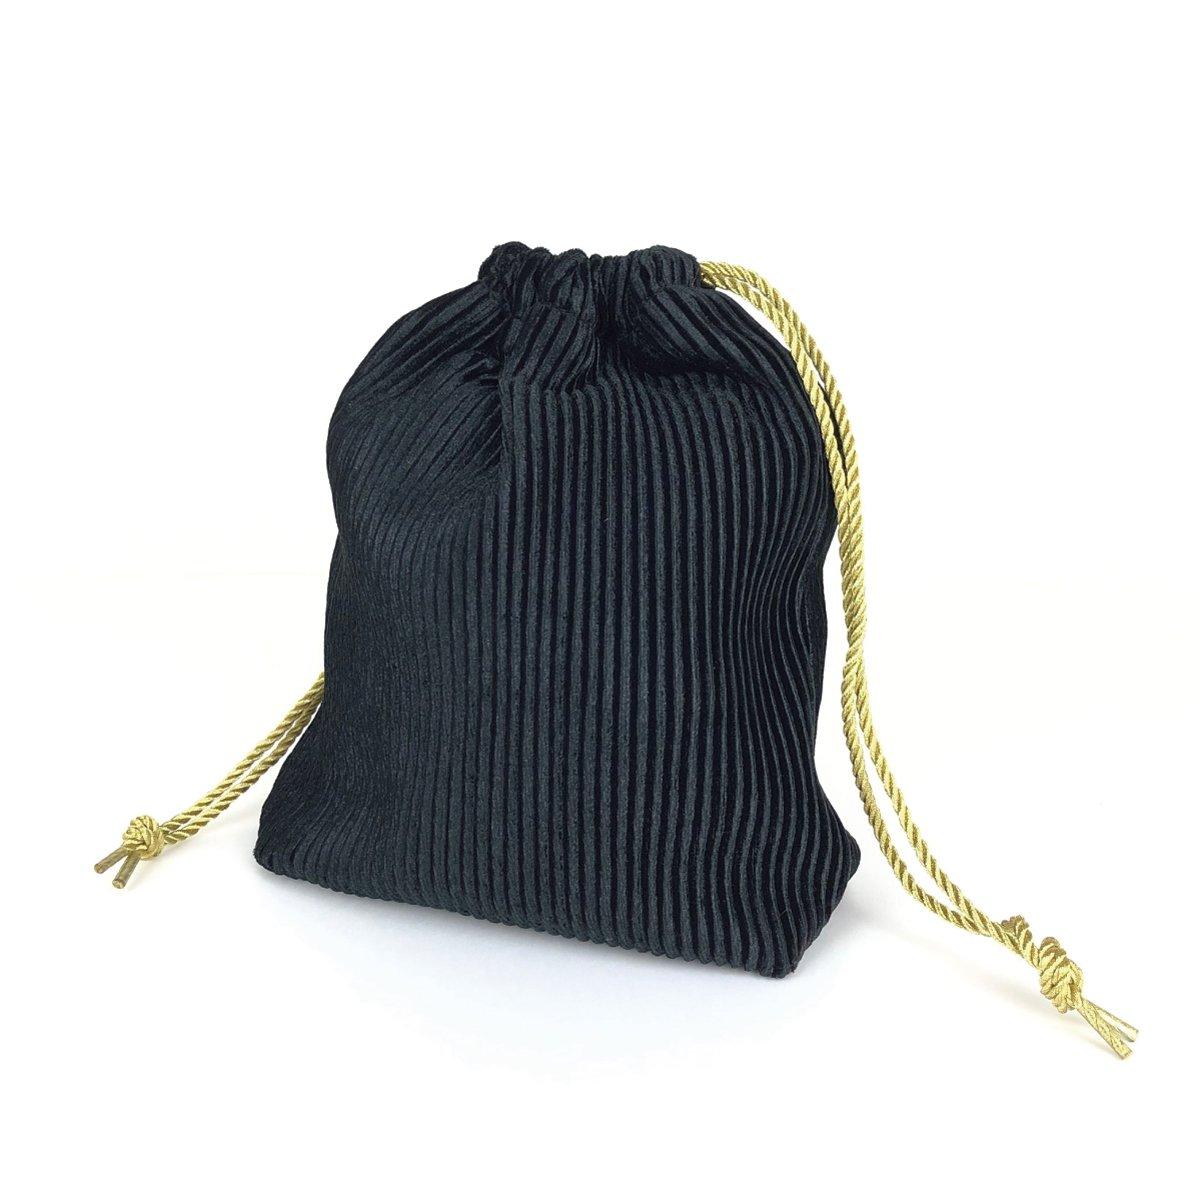 Classy Pleats Bag 詳細画像4